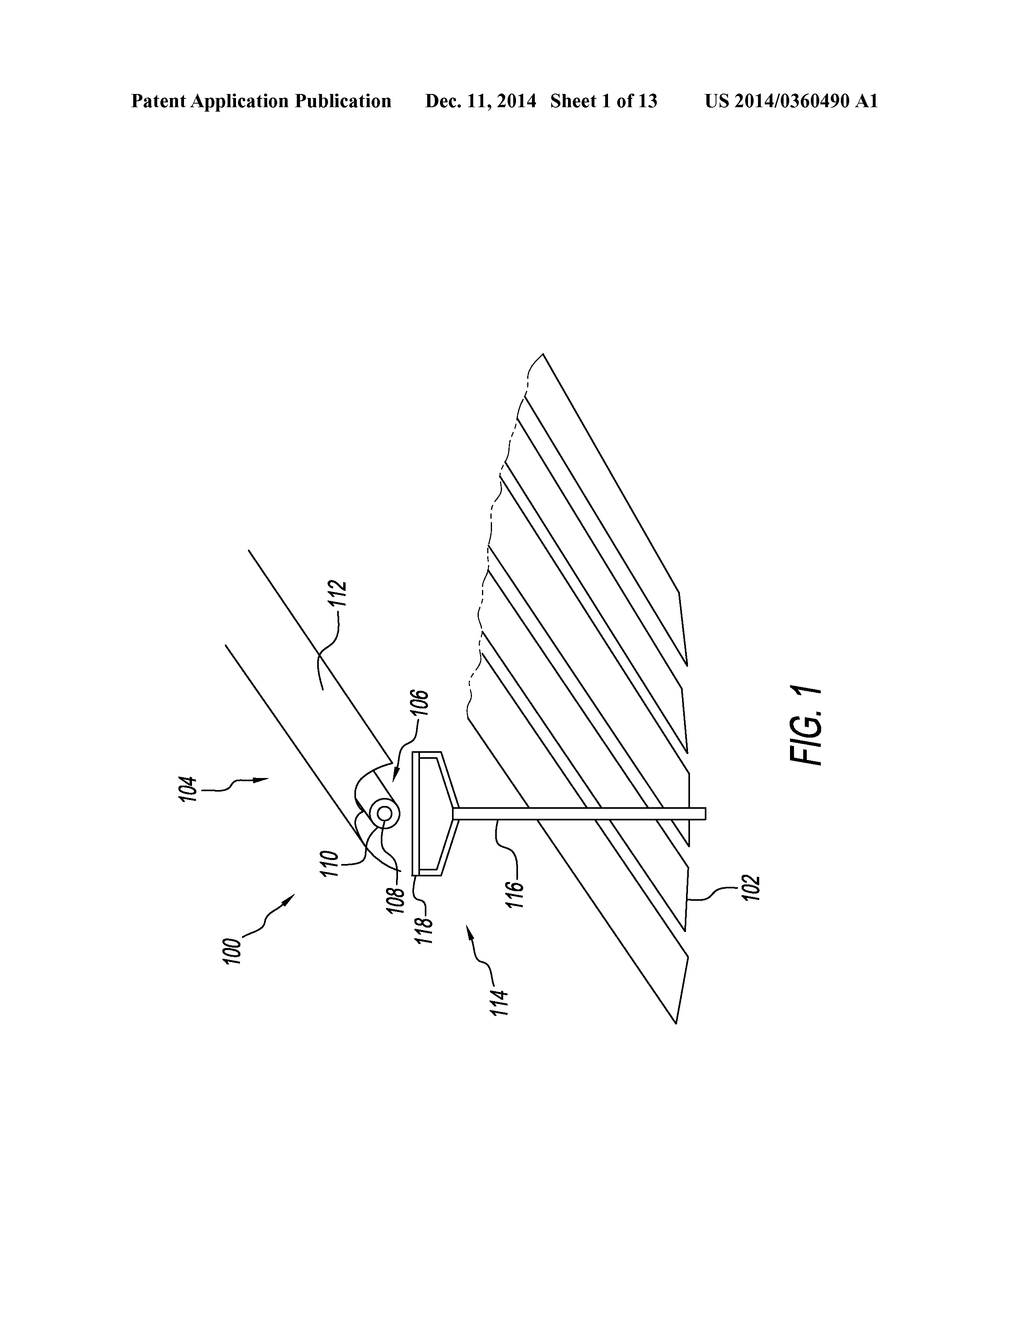 Receiver system for a fresnel solar plant diagram schematic receiver system for a fresnel solar plant diagram schematic and image 02 pooptronica Gallery